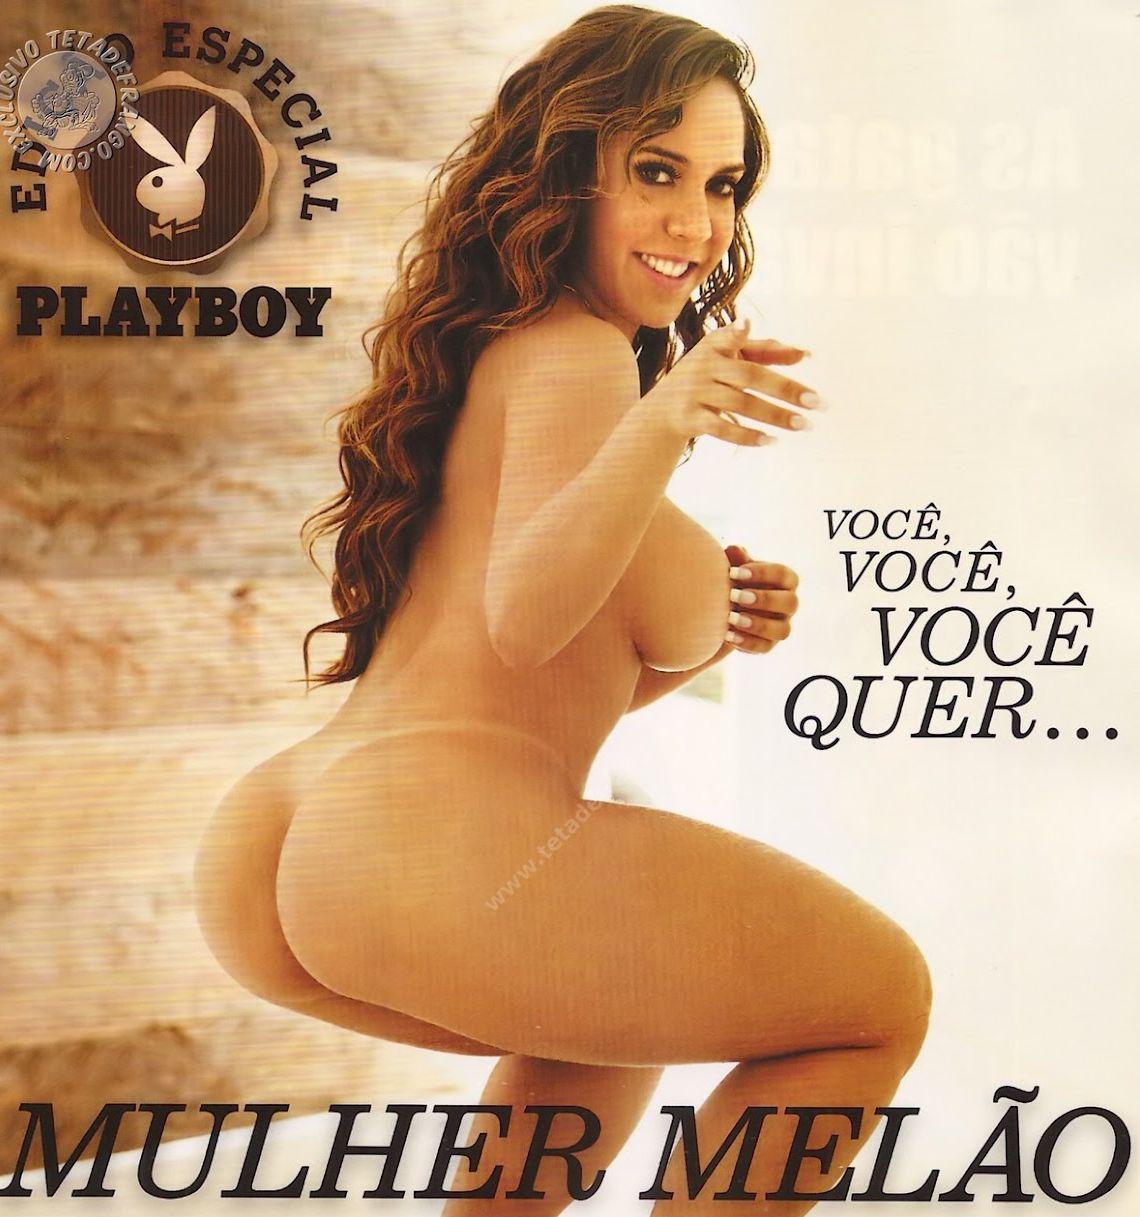 renata-frisson-mulher-melao-nua-playboy-01